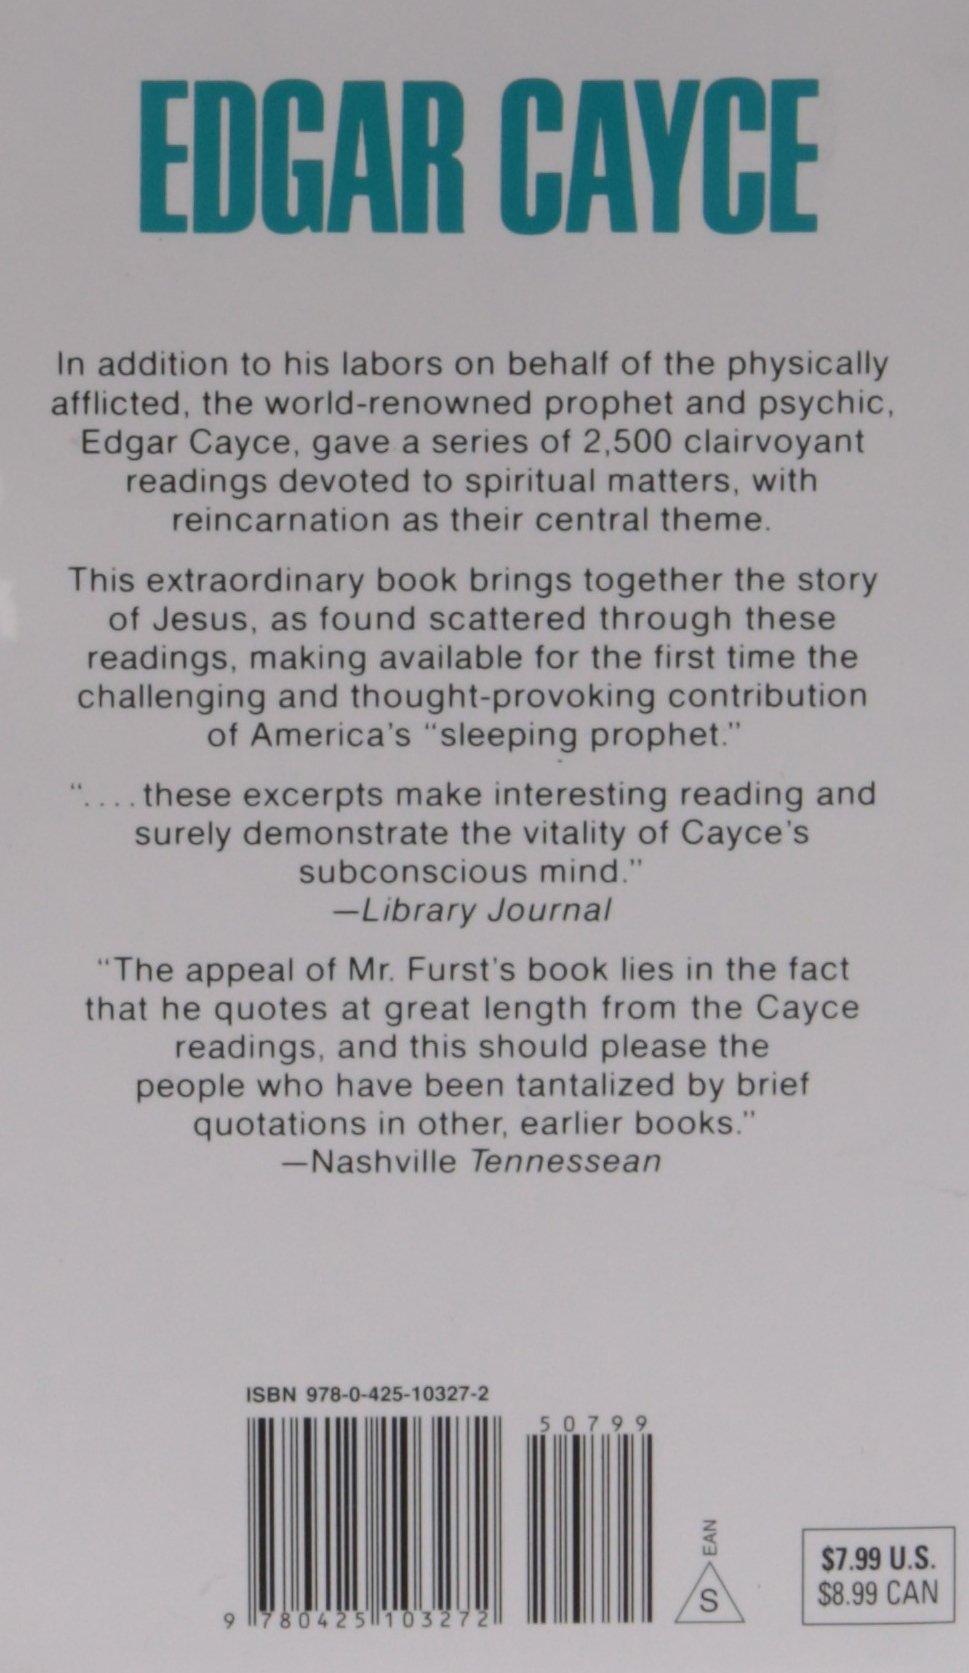 Edgar Cayce's Story of Jesus: Jeffrey Furst: 9780425103272